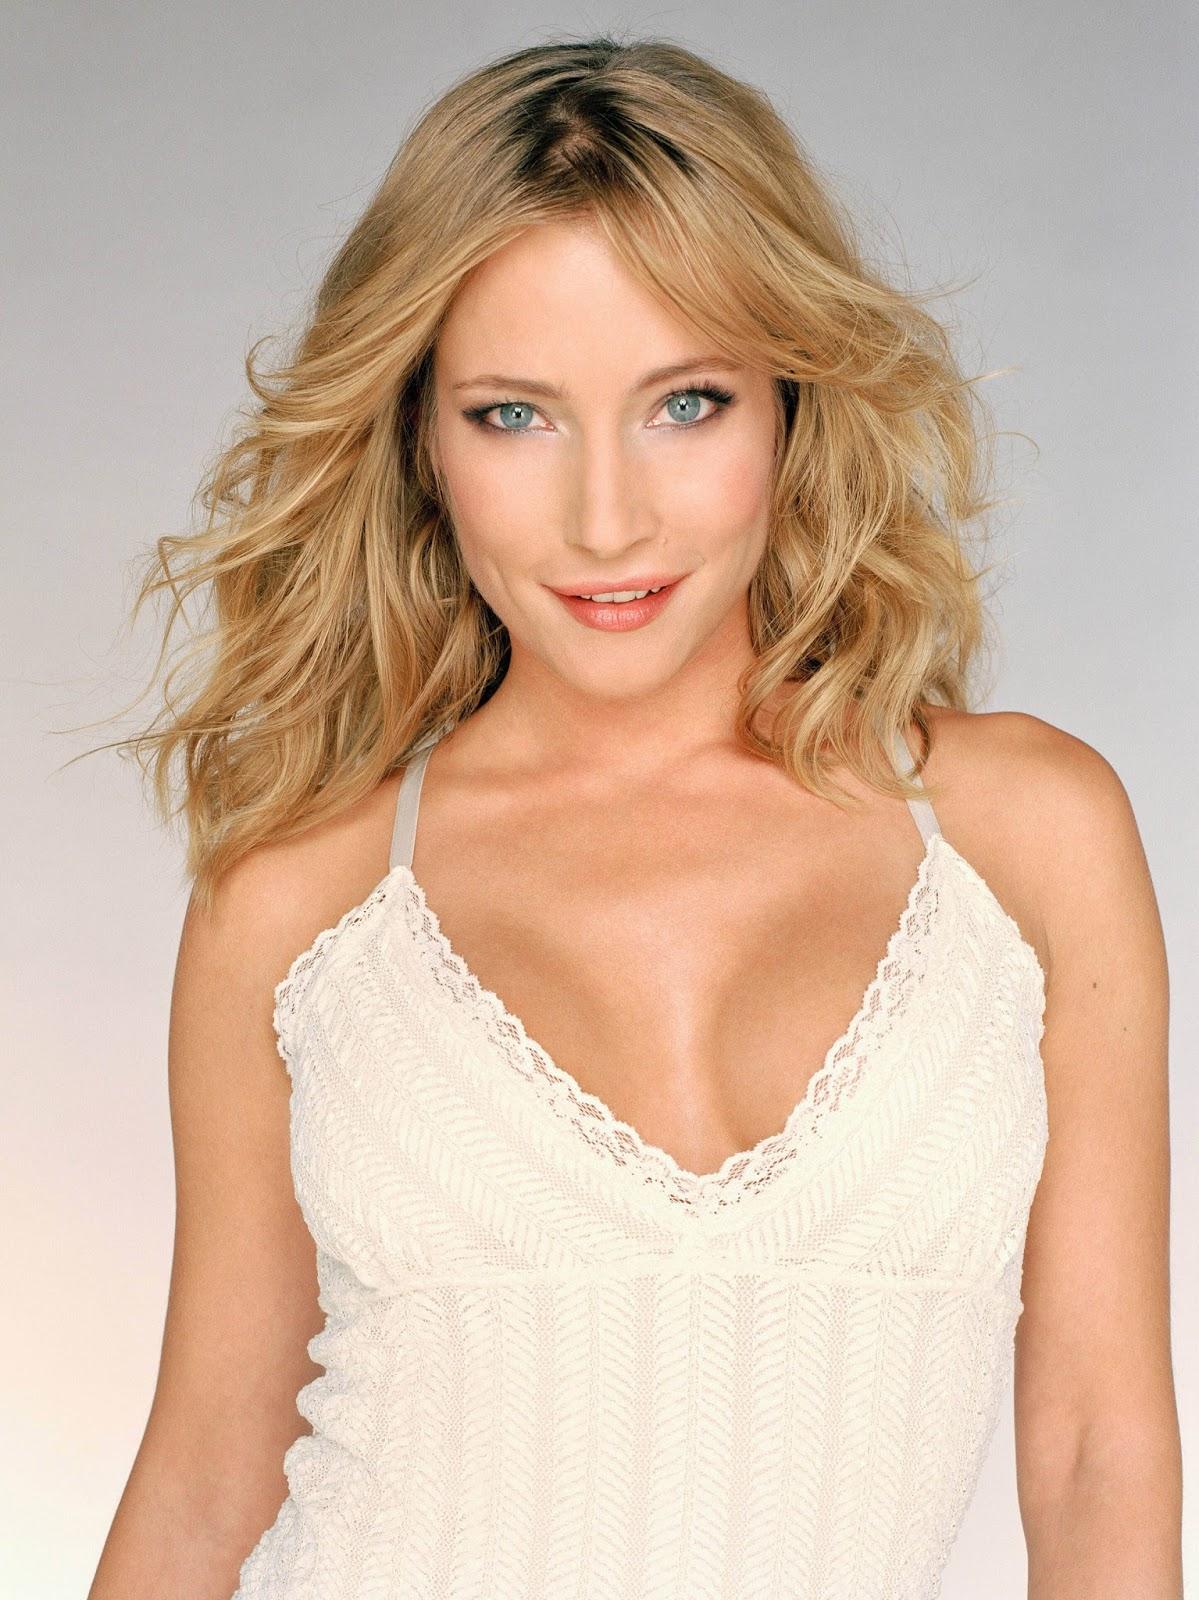 Florentine Lahme florentine lahme hot cleavage hq photos at michael bernhard